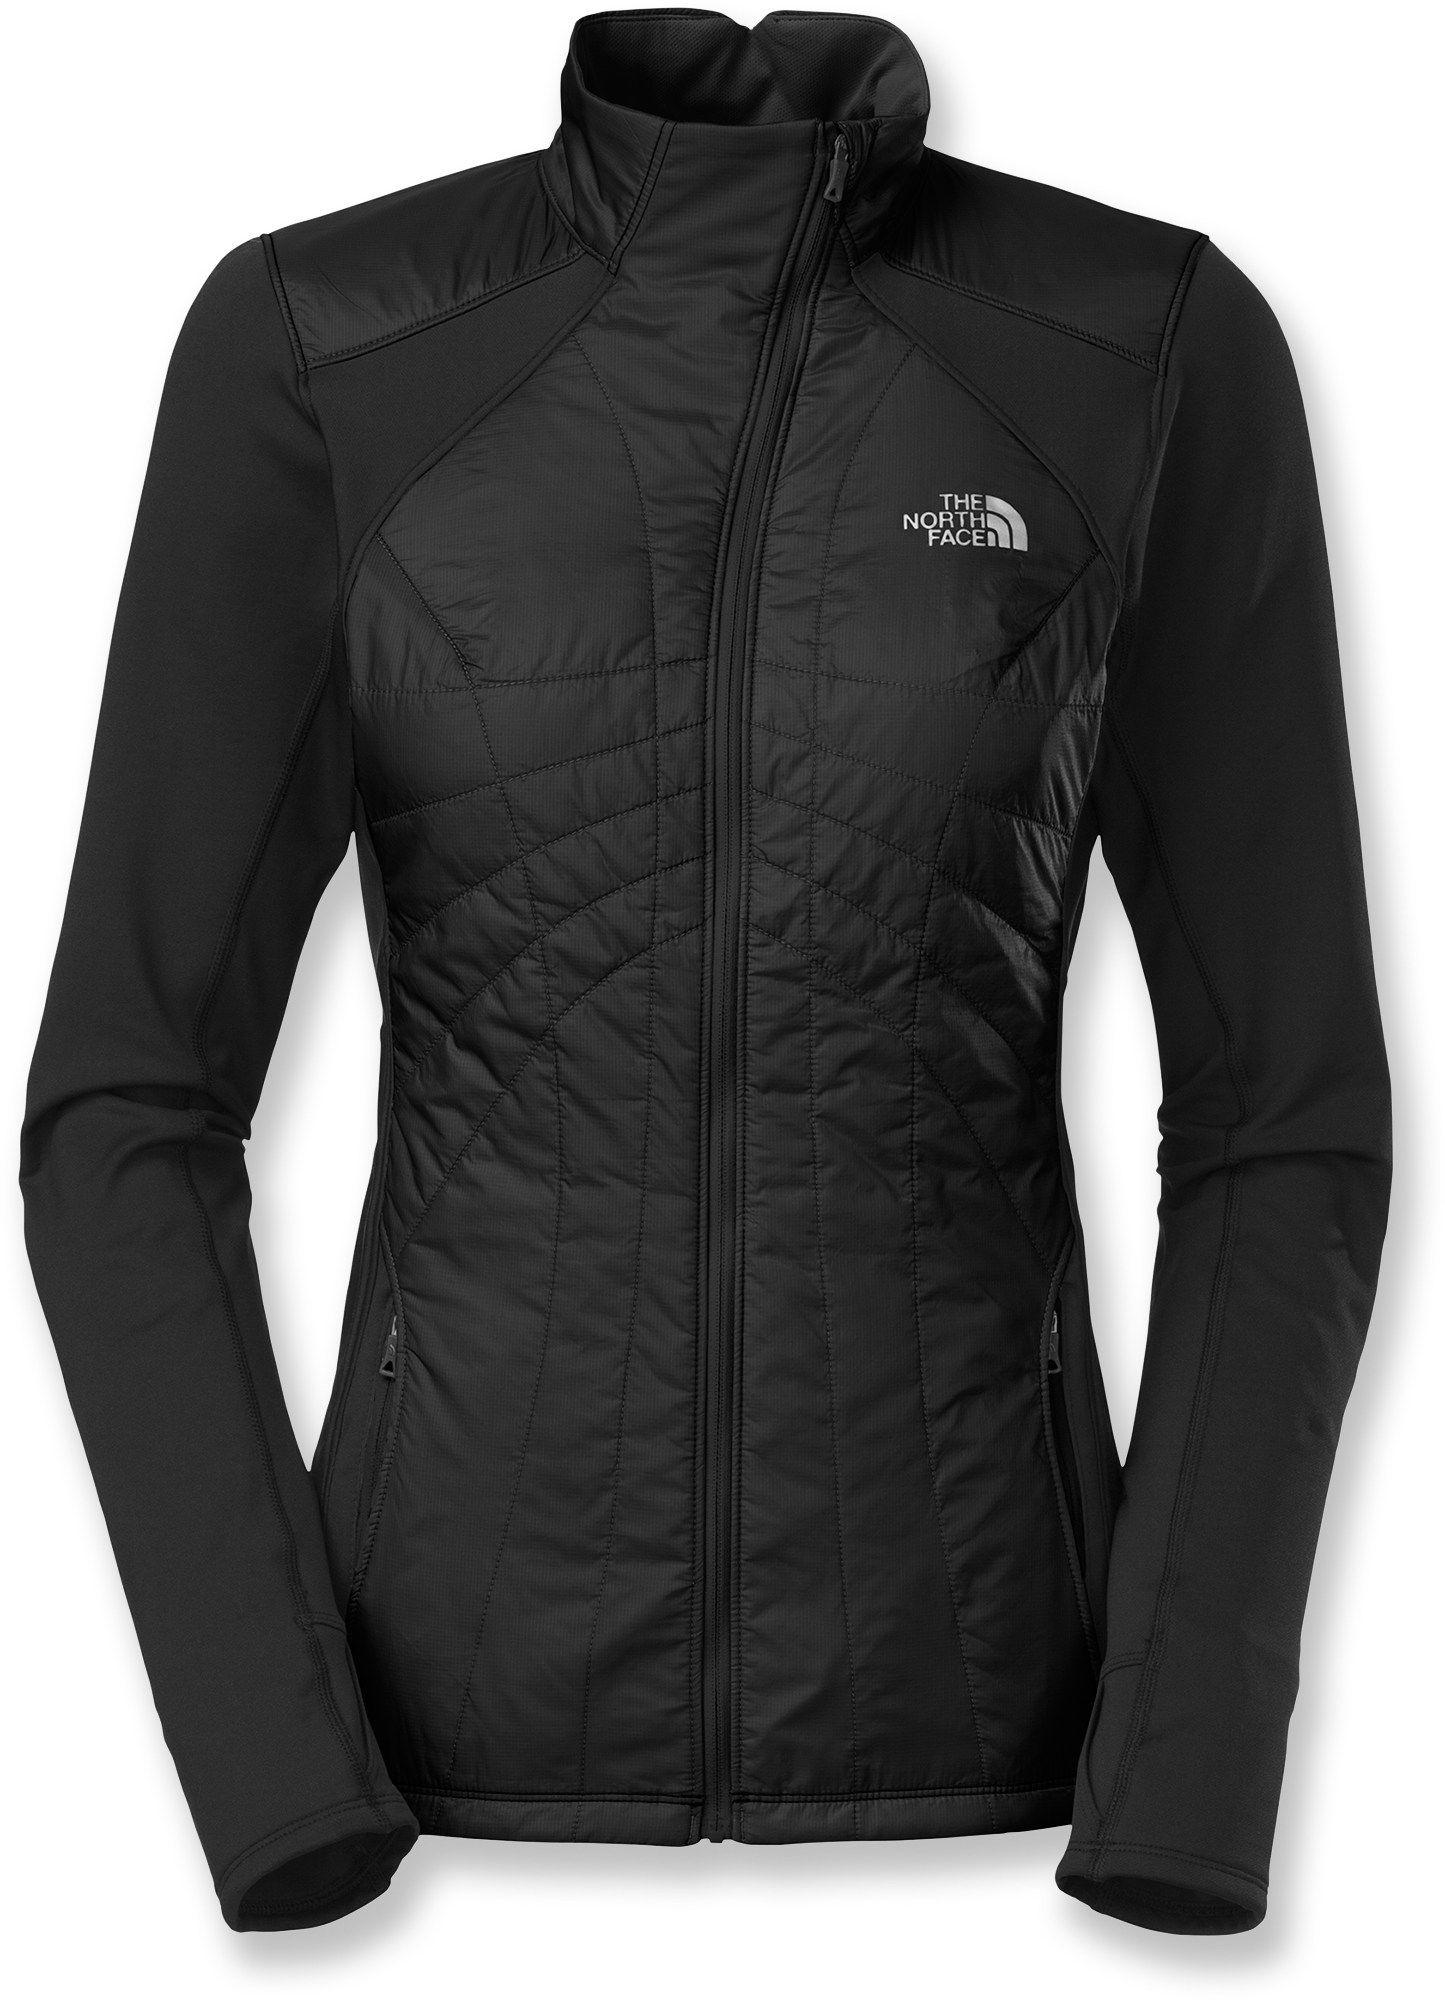 The North Face Animagi Jacket - Women's | REI Co-op ...